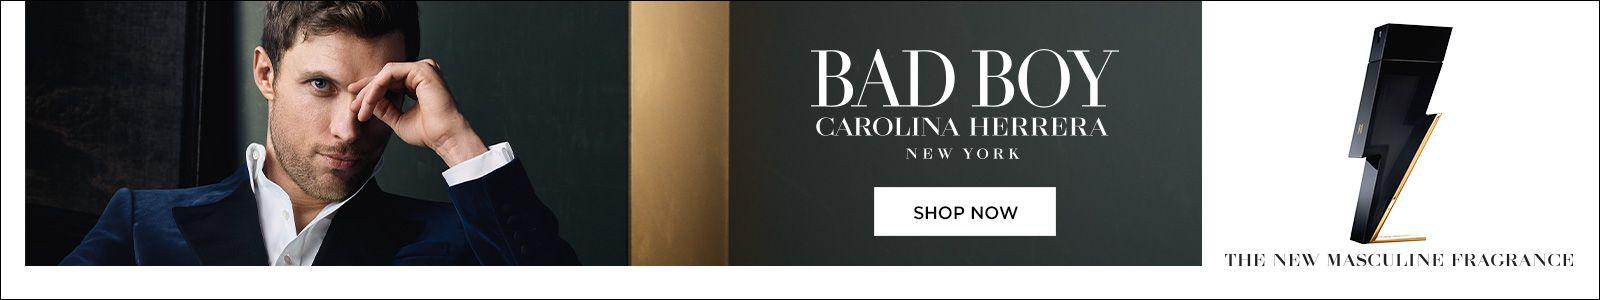 Bad Boy, Carolina Herrera, New York, Shop Now, The New Masculine Fragrance